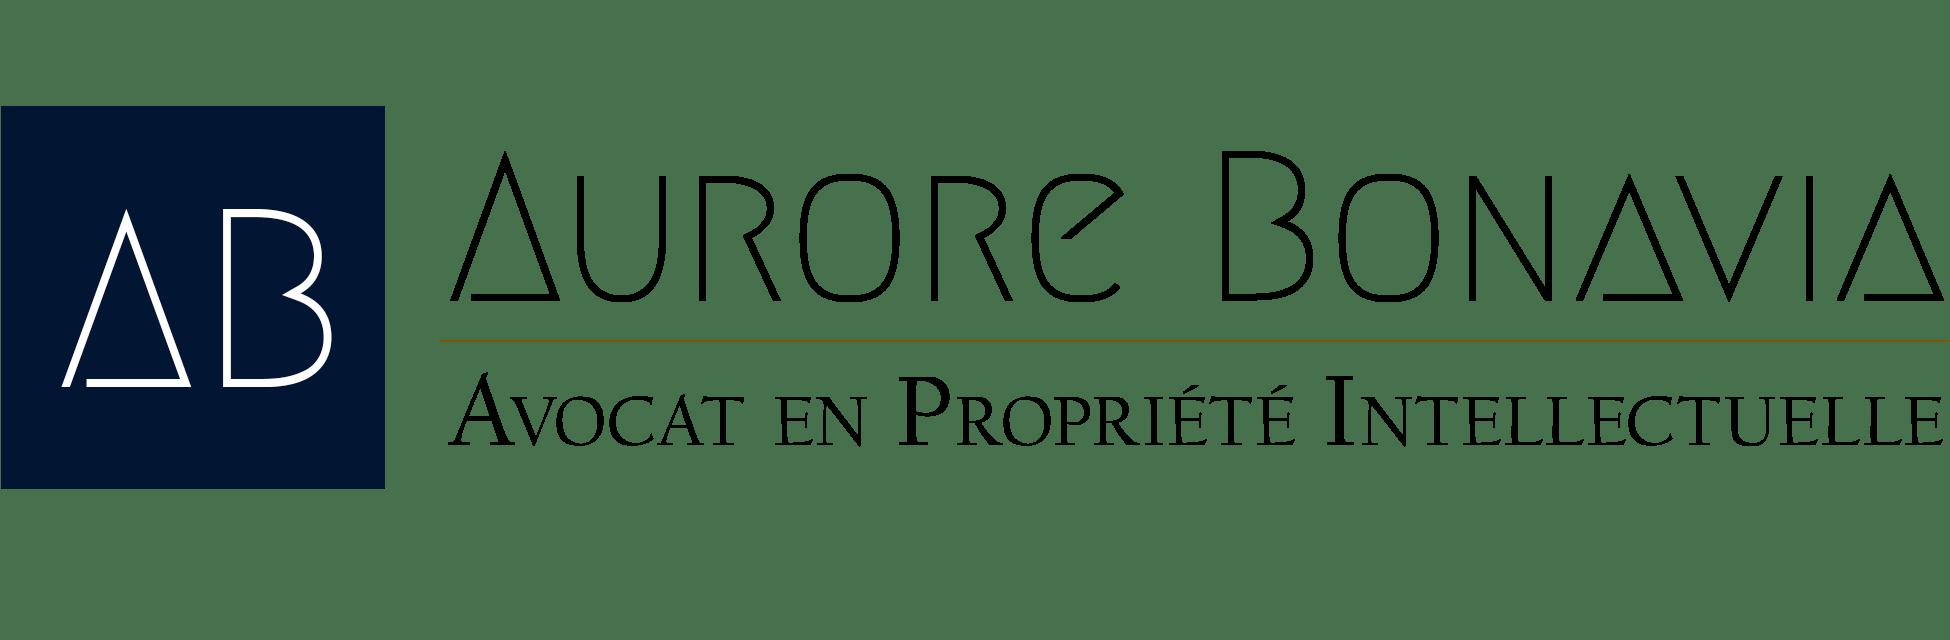 Aurore Bonavia